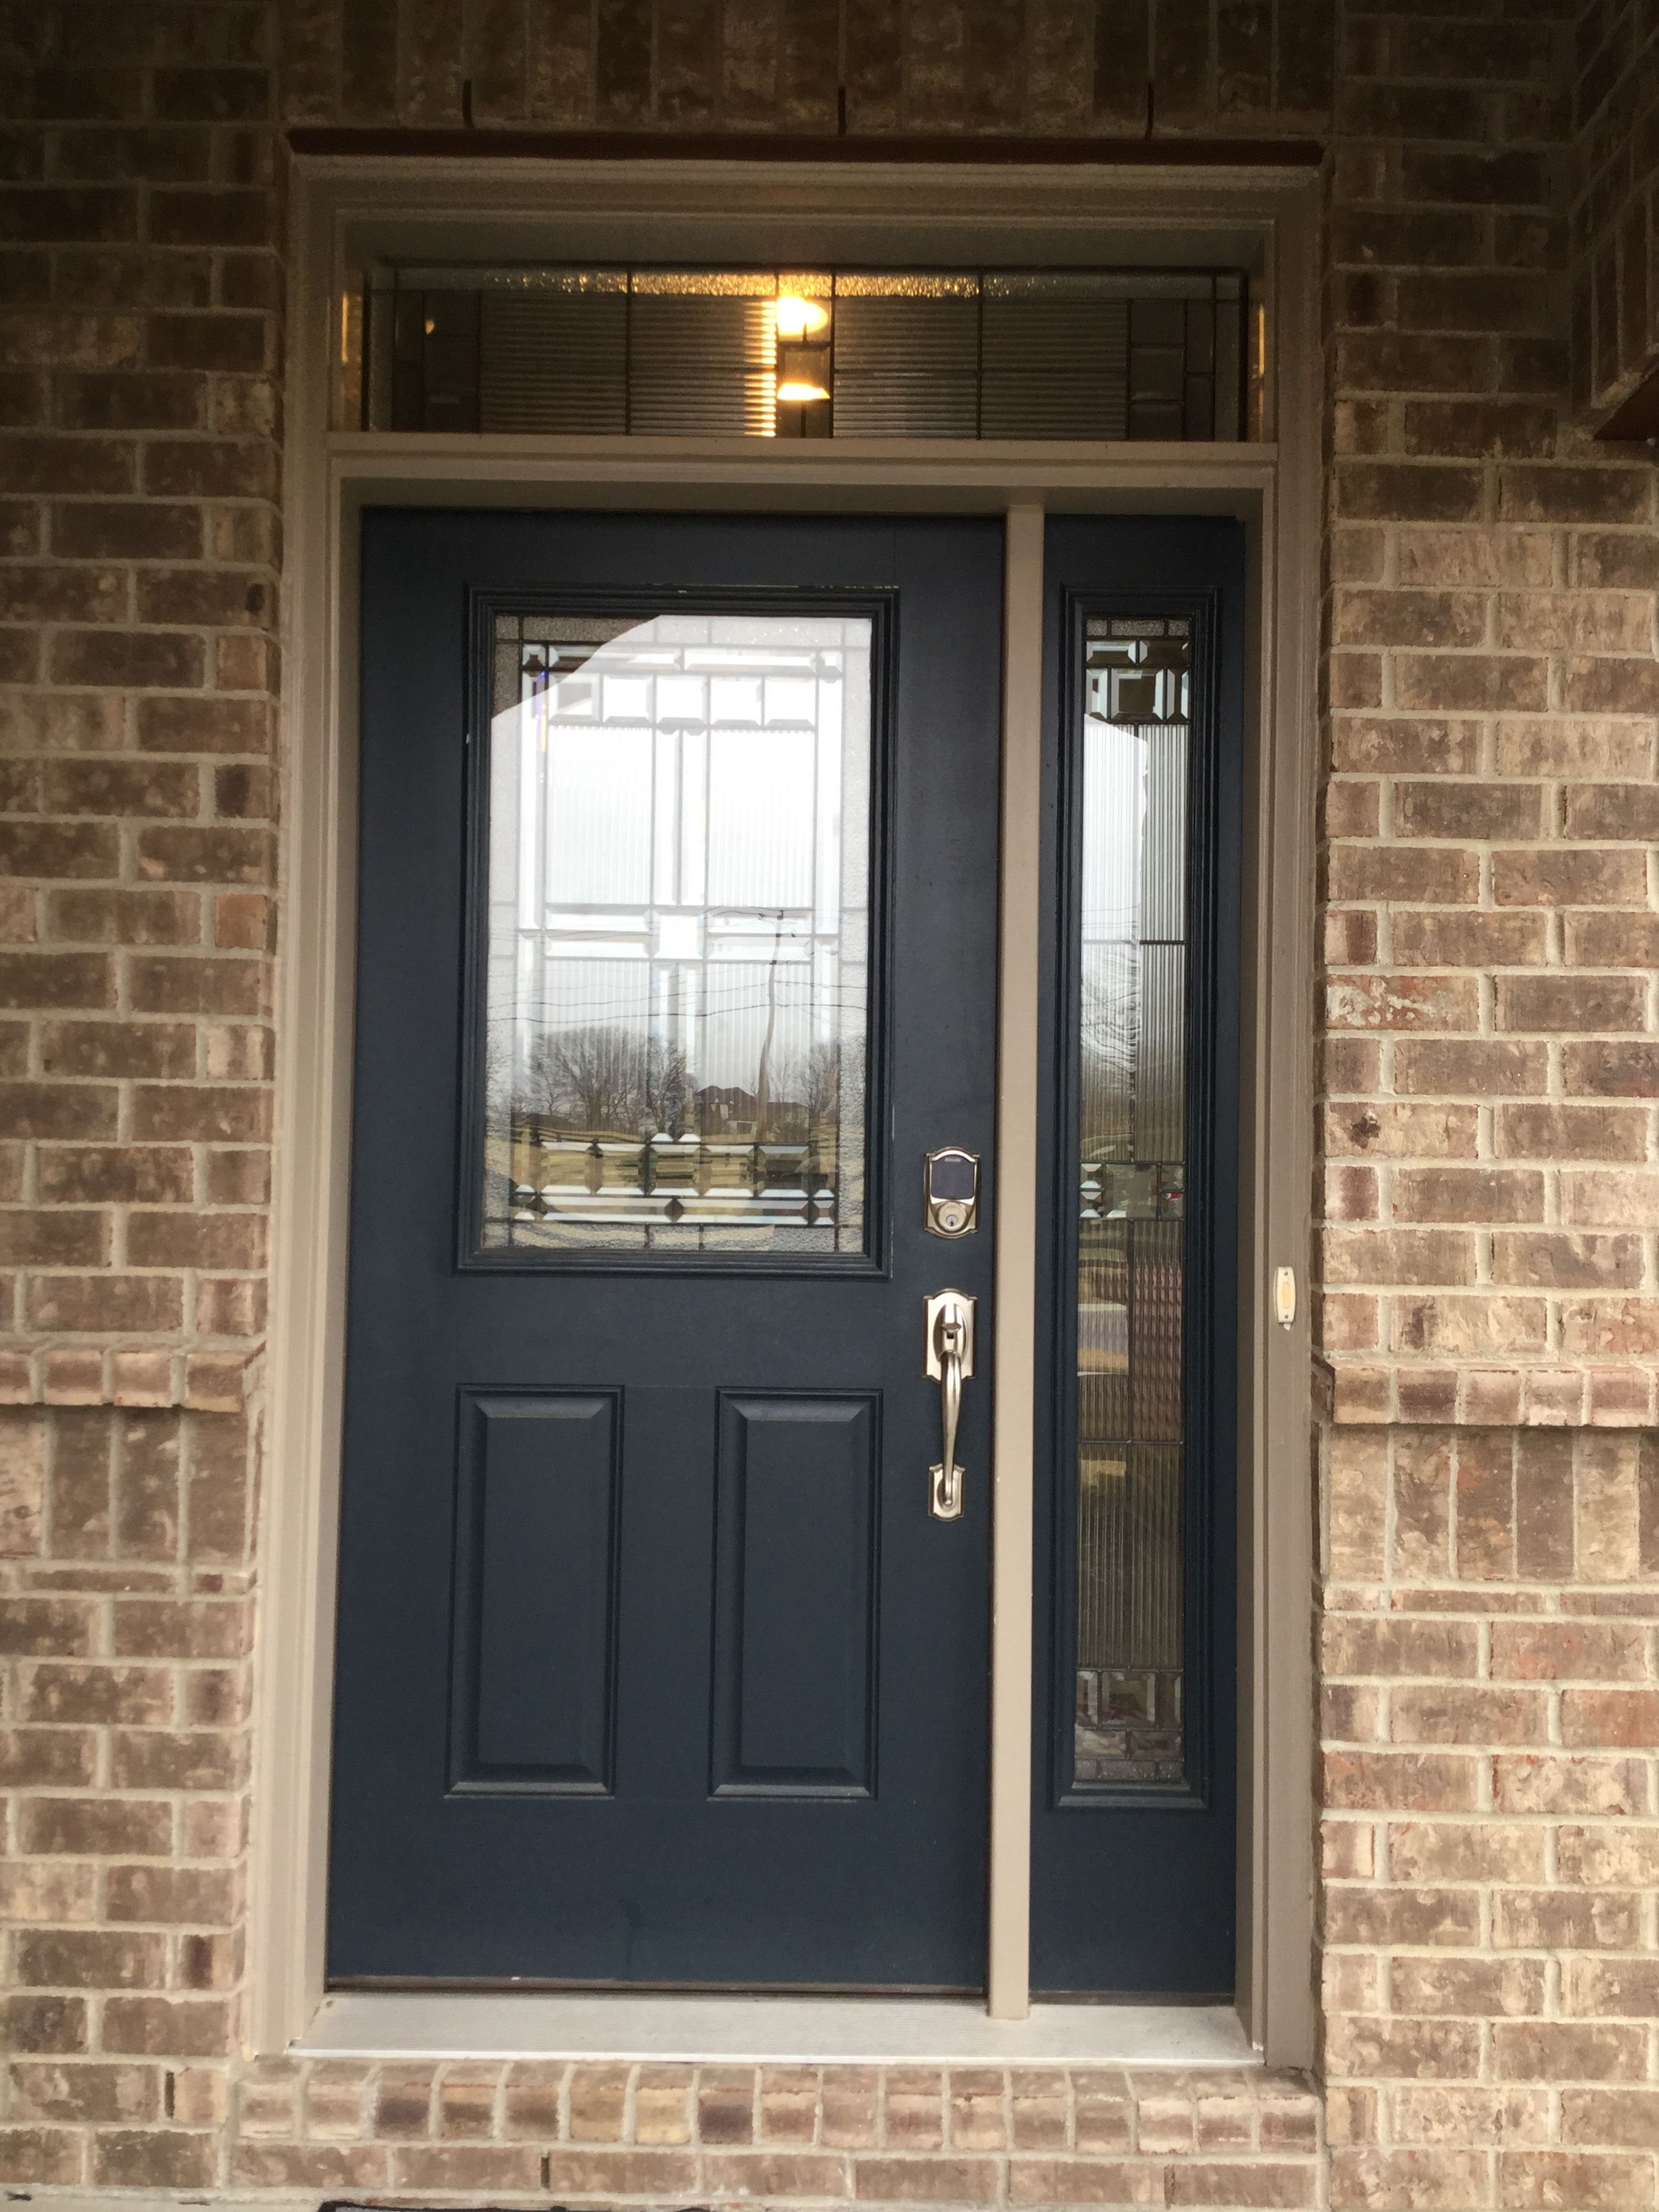 Superbe UPGRADED FRONT DOOR, SIDELITE, AND TRANSOM